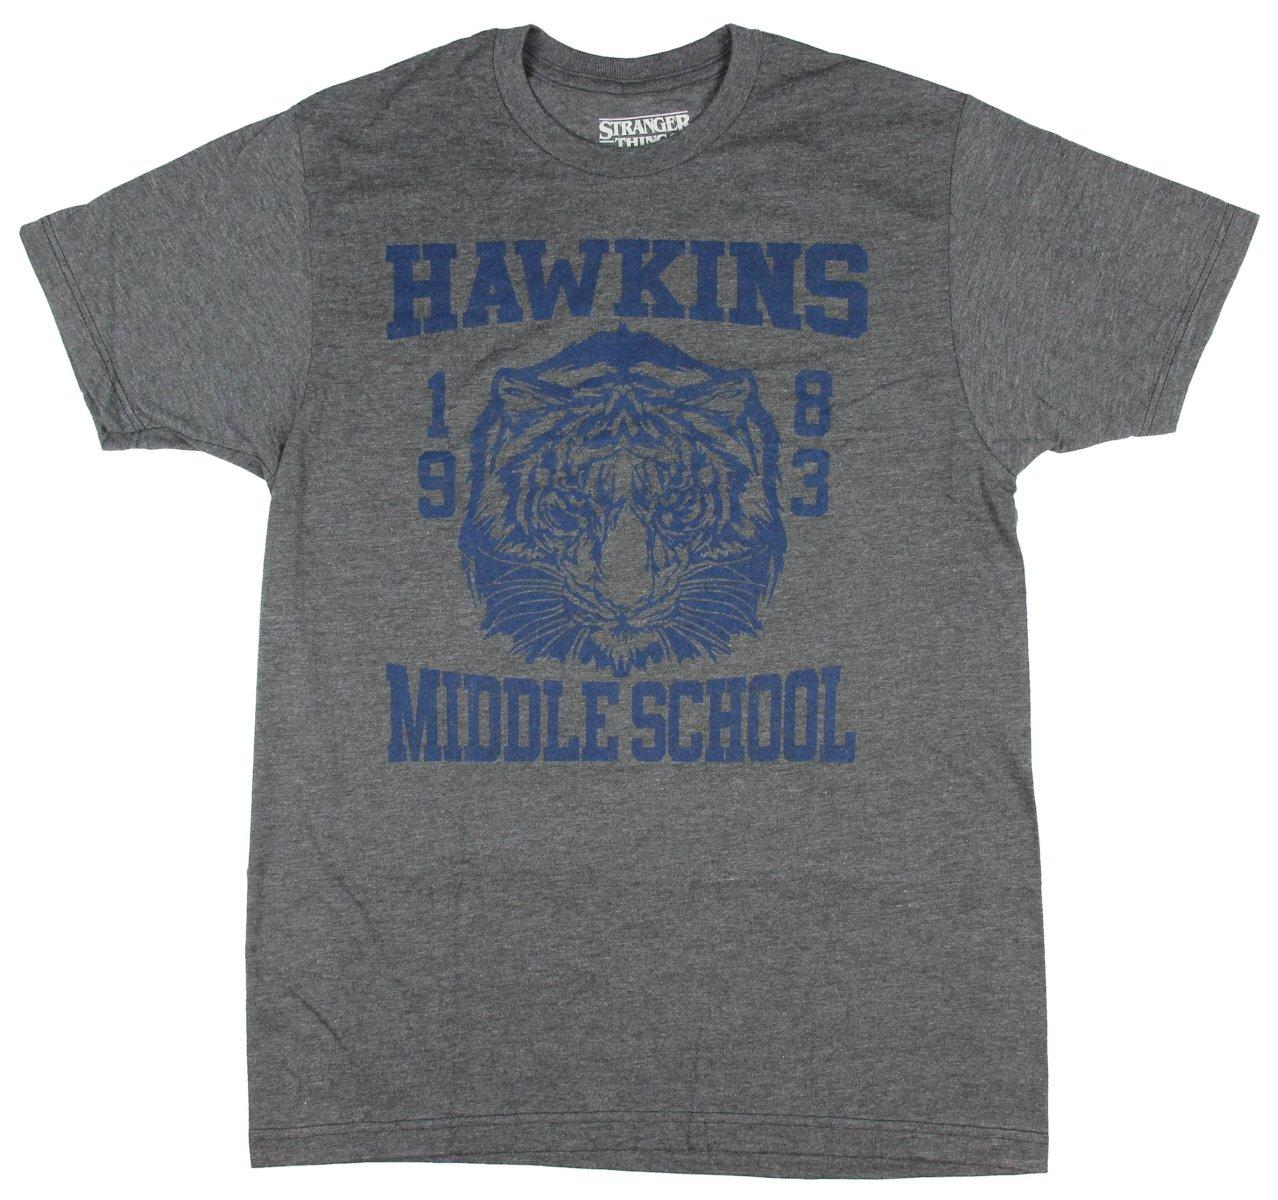 Stranger Things Hawkins Middle School Television Series S Tshirt